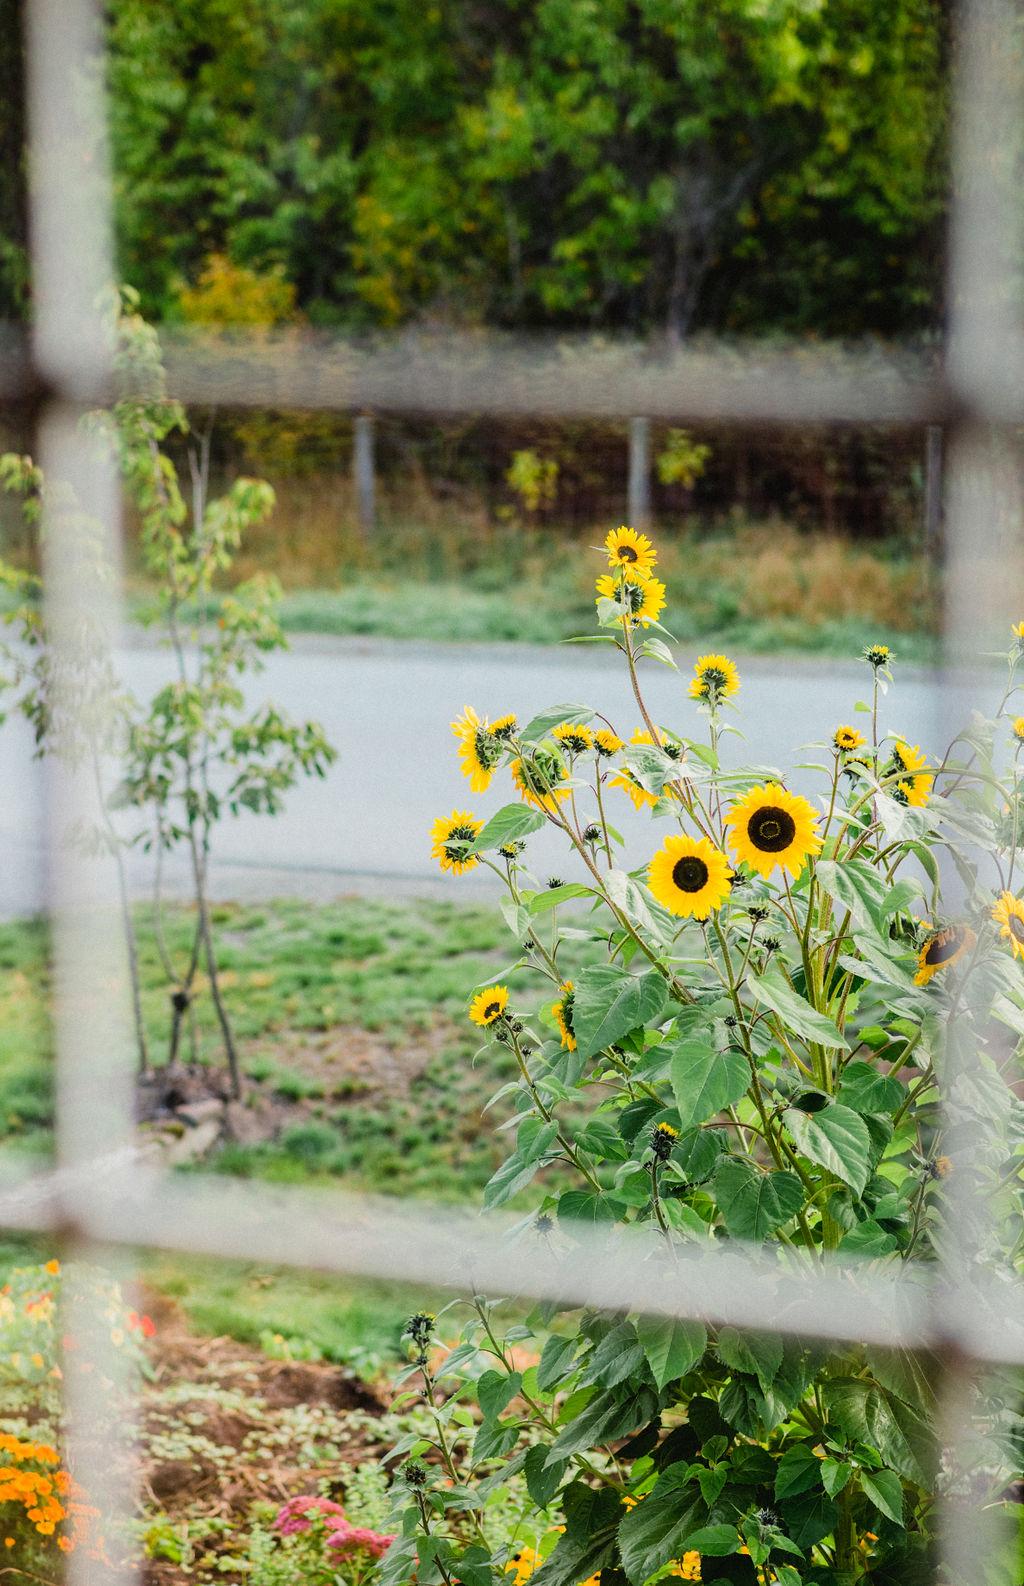 Sunflower window photo credit: Jessie McNaught